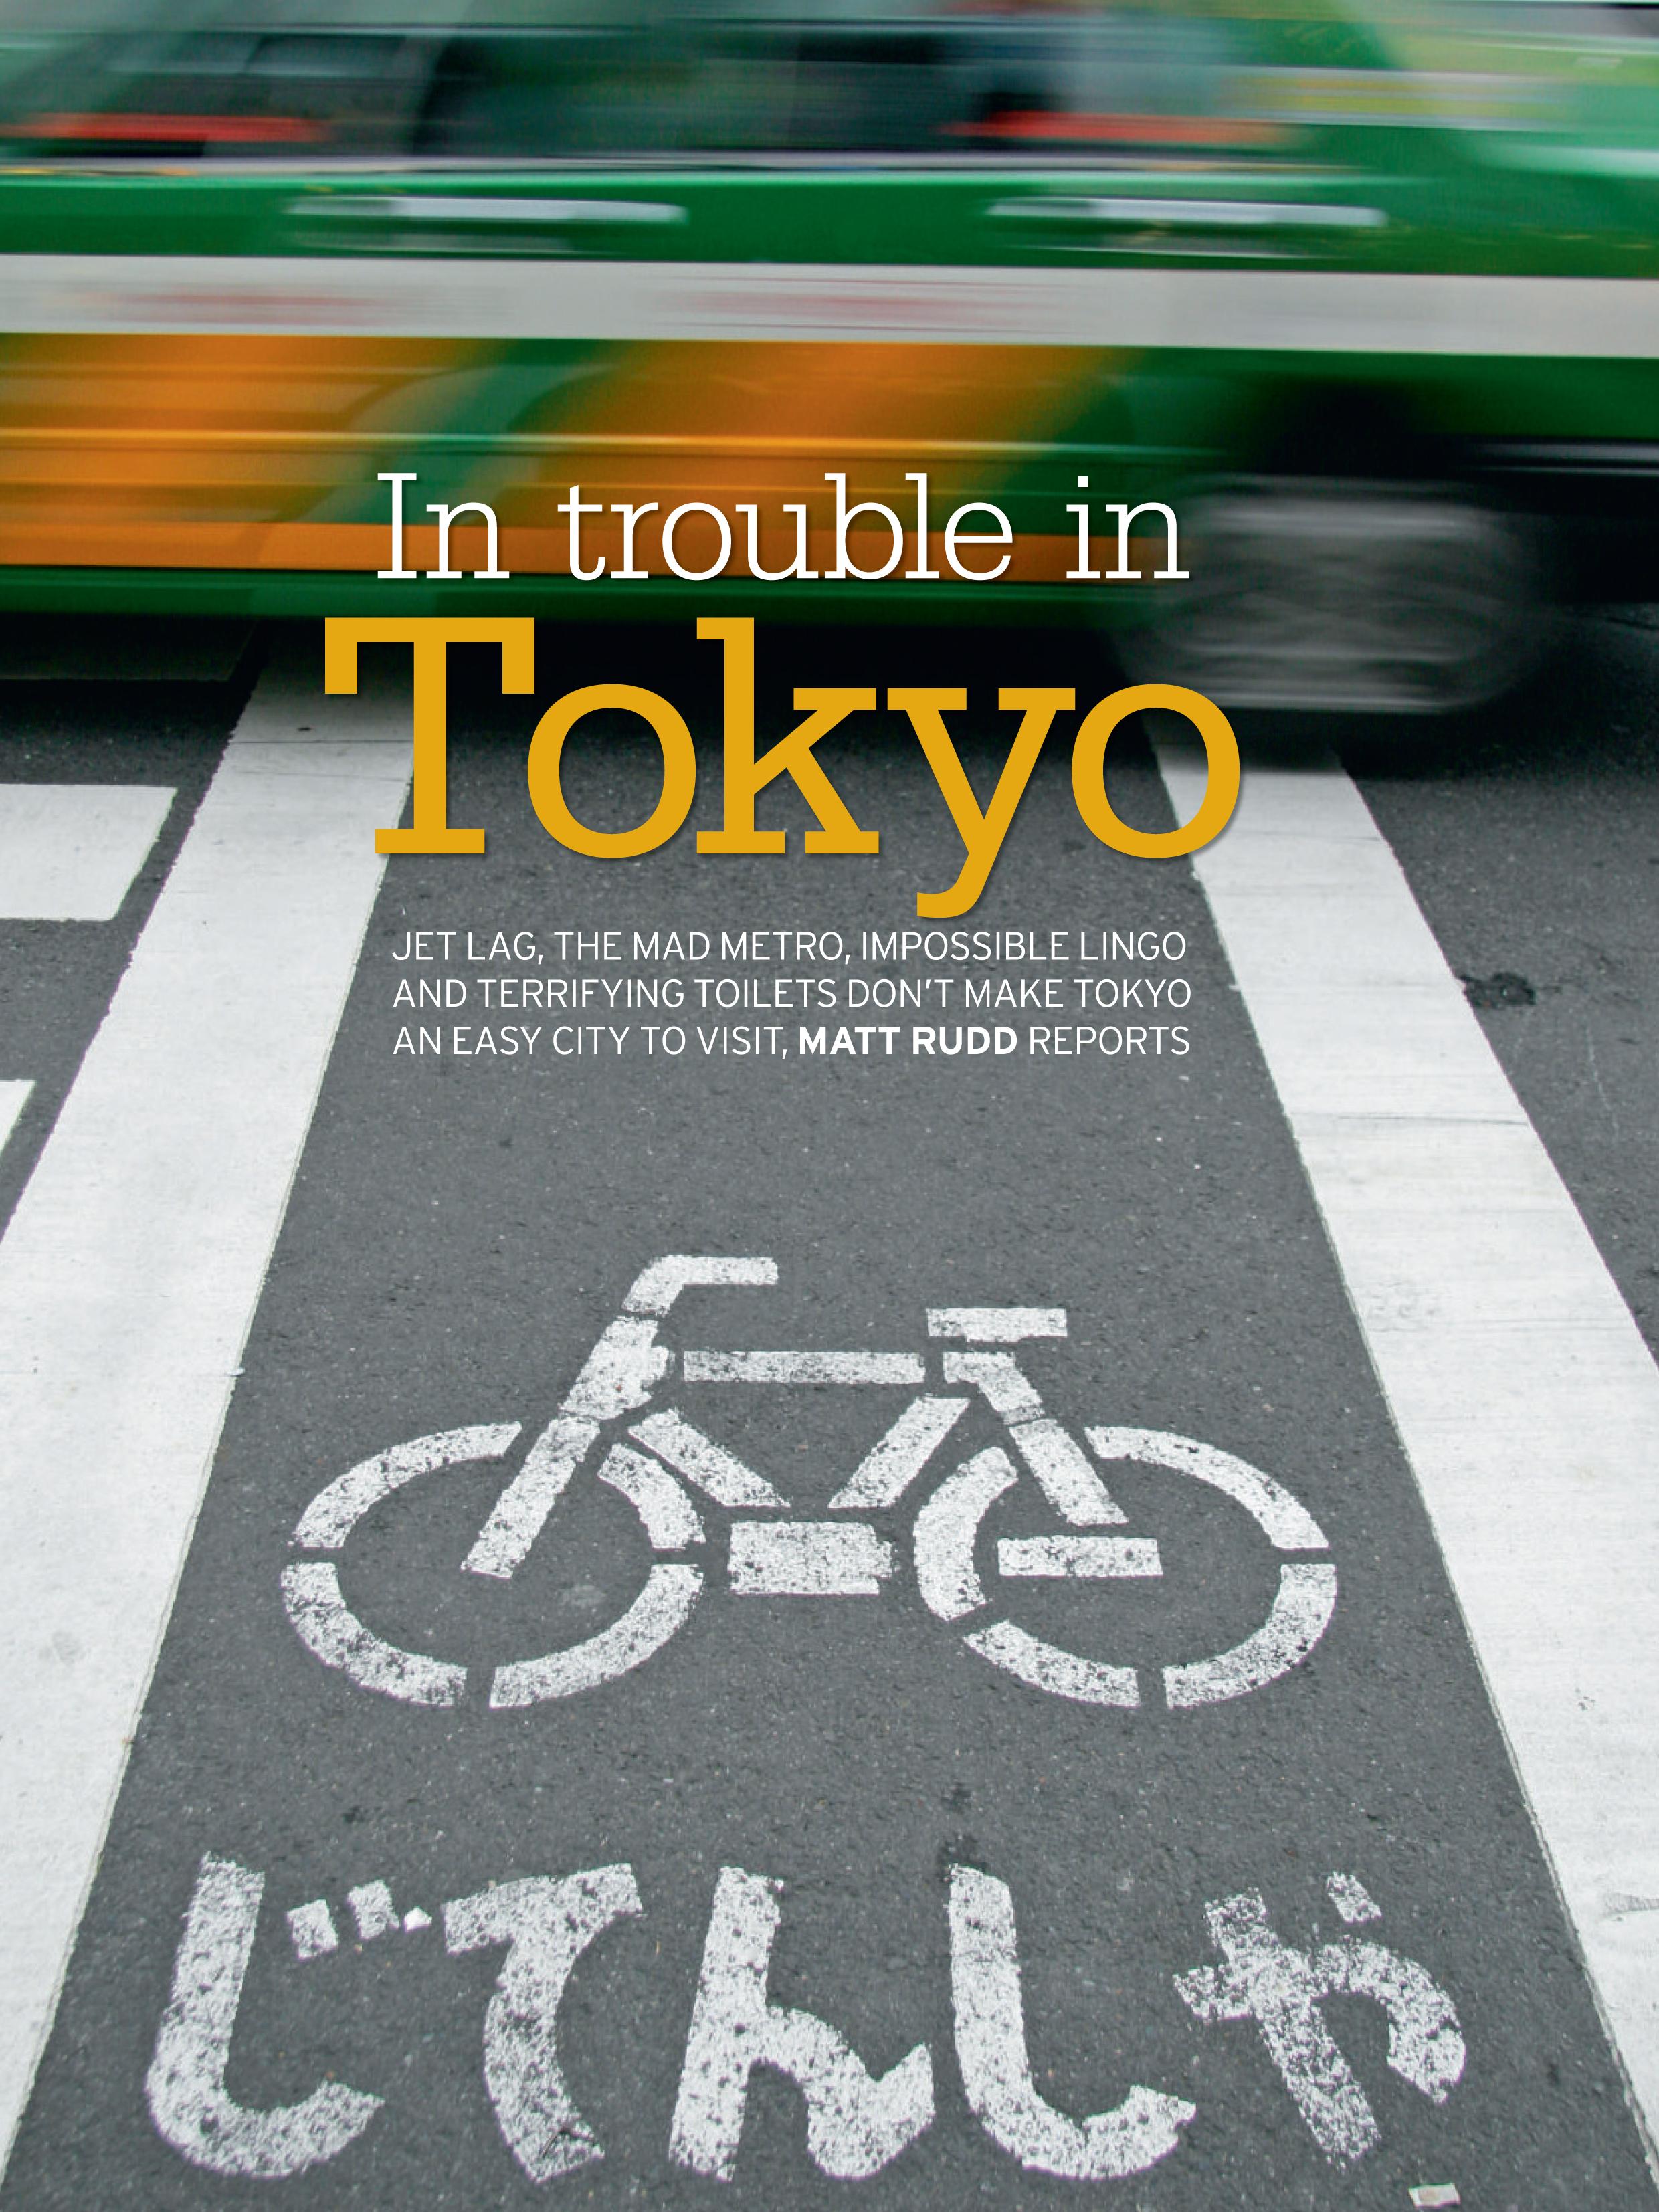 Tokyo-travel.jpg